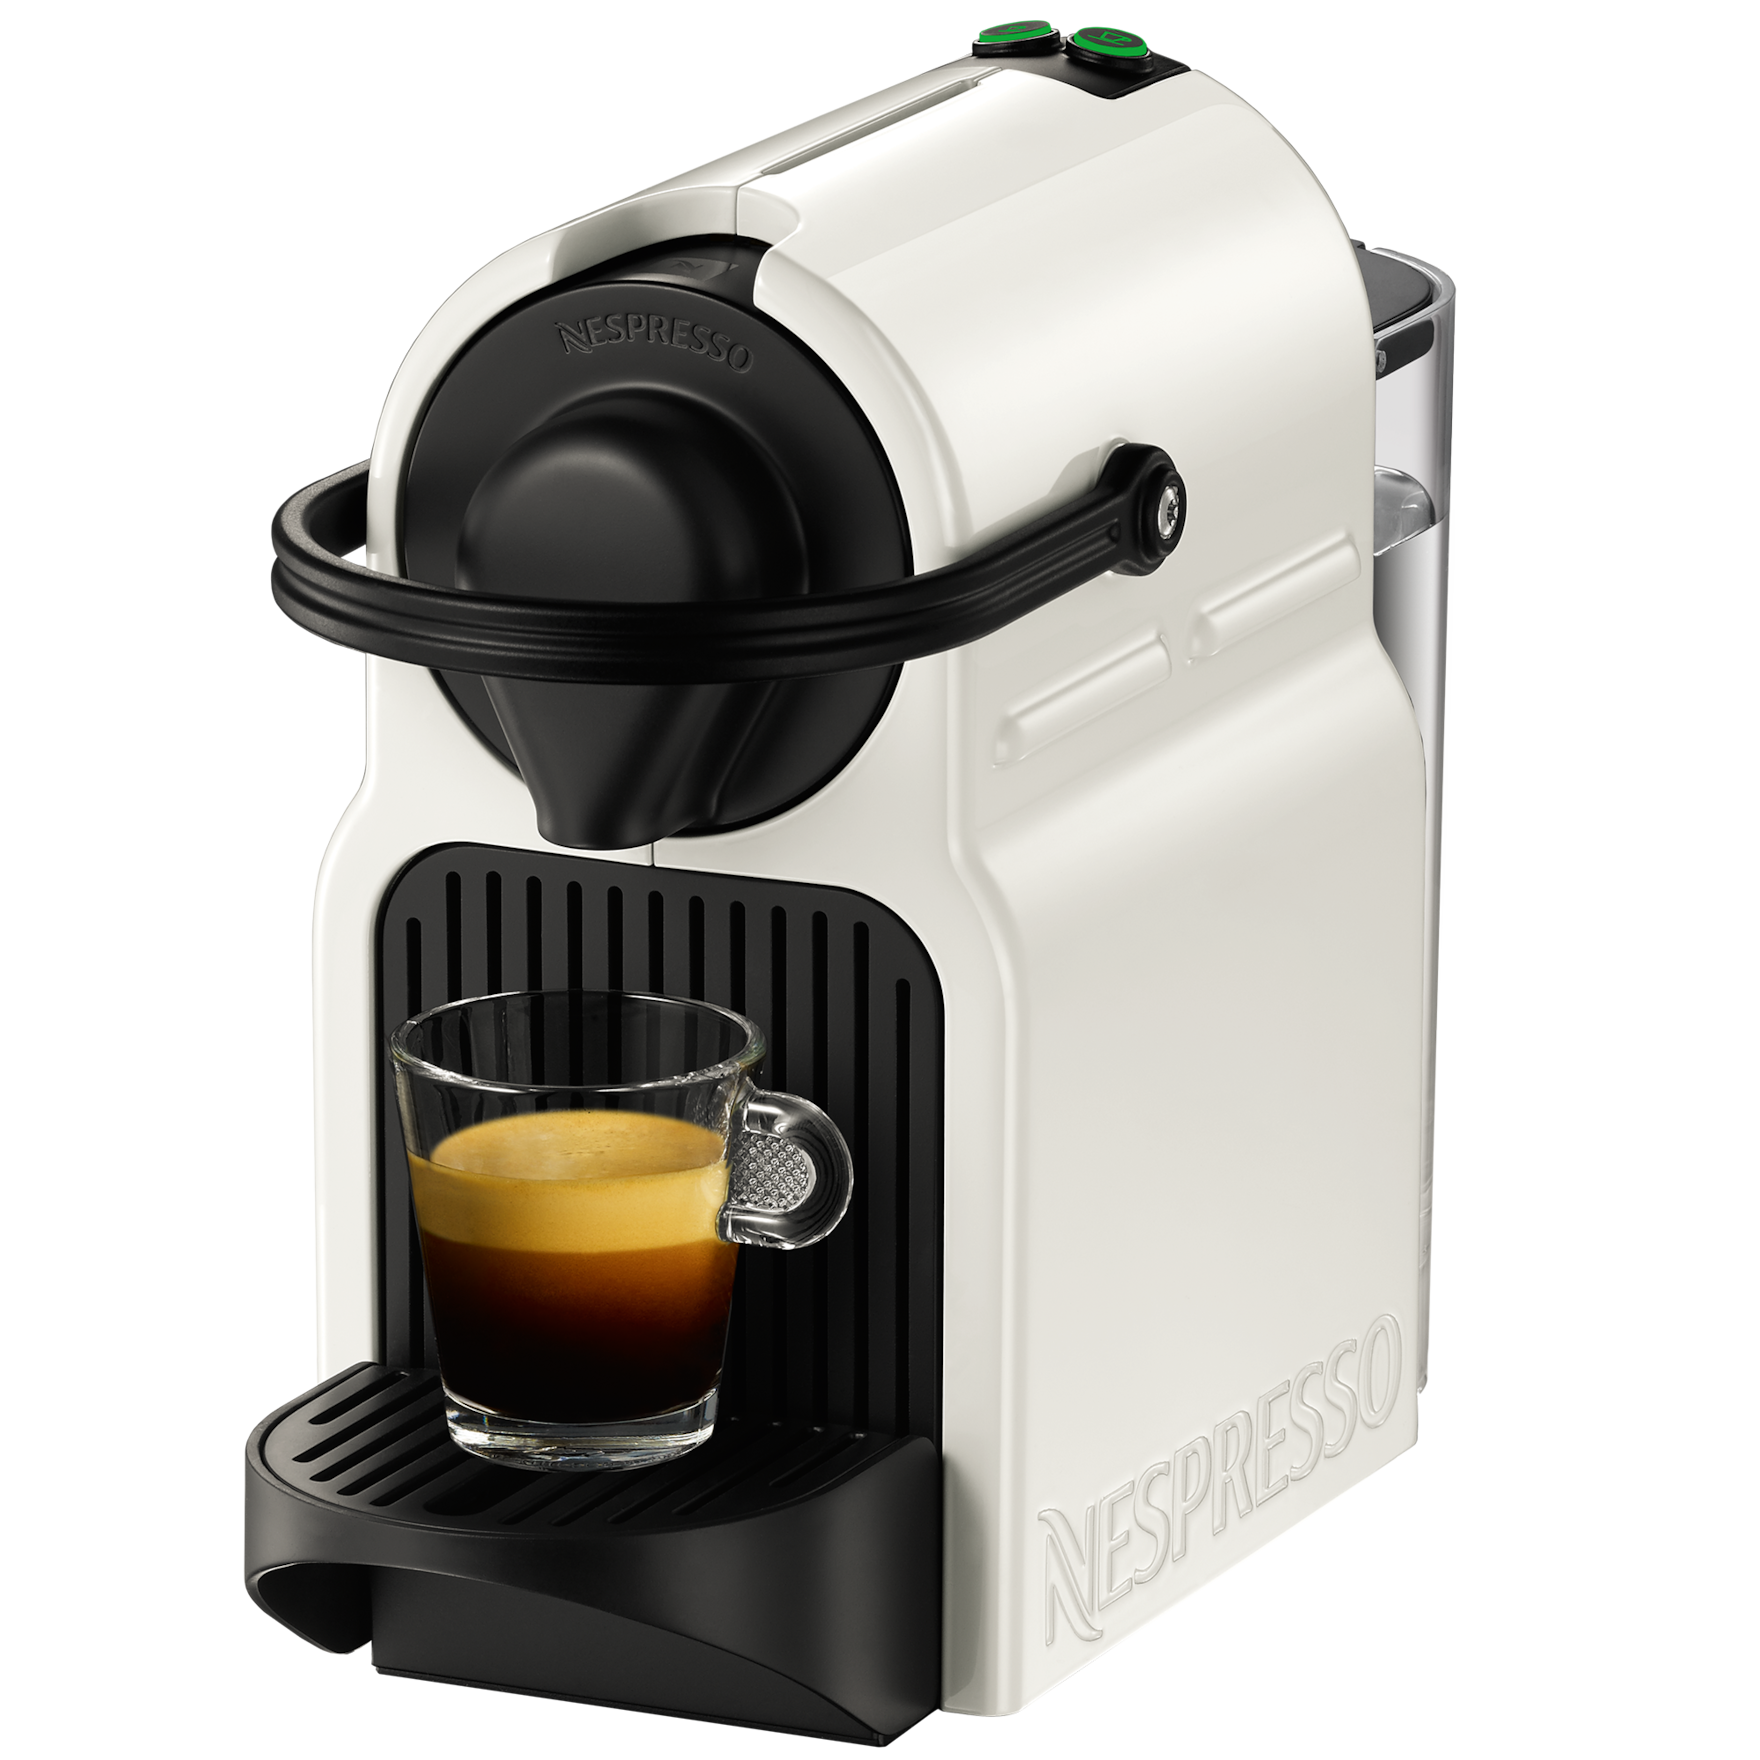 cafetiere nespresso 2000